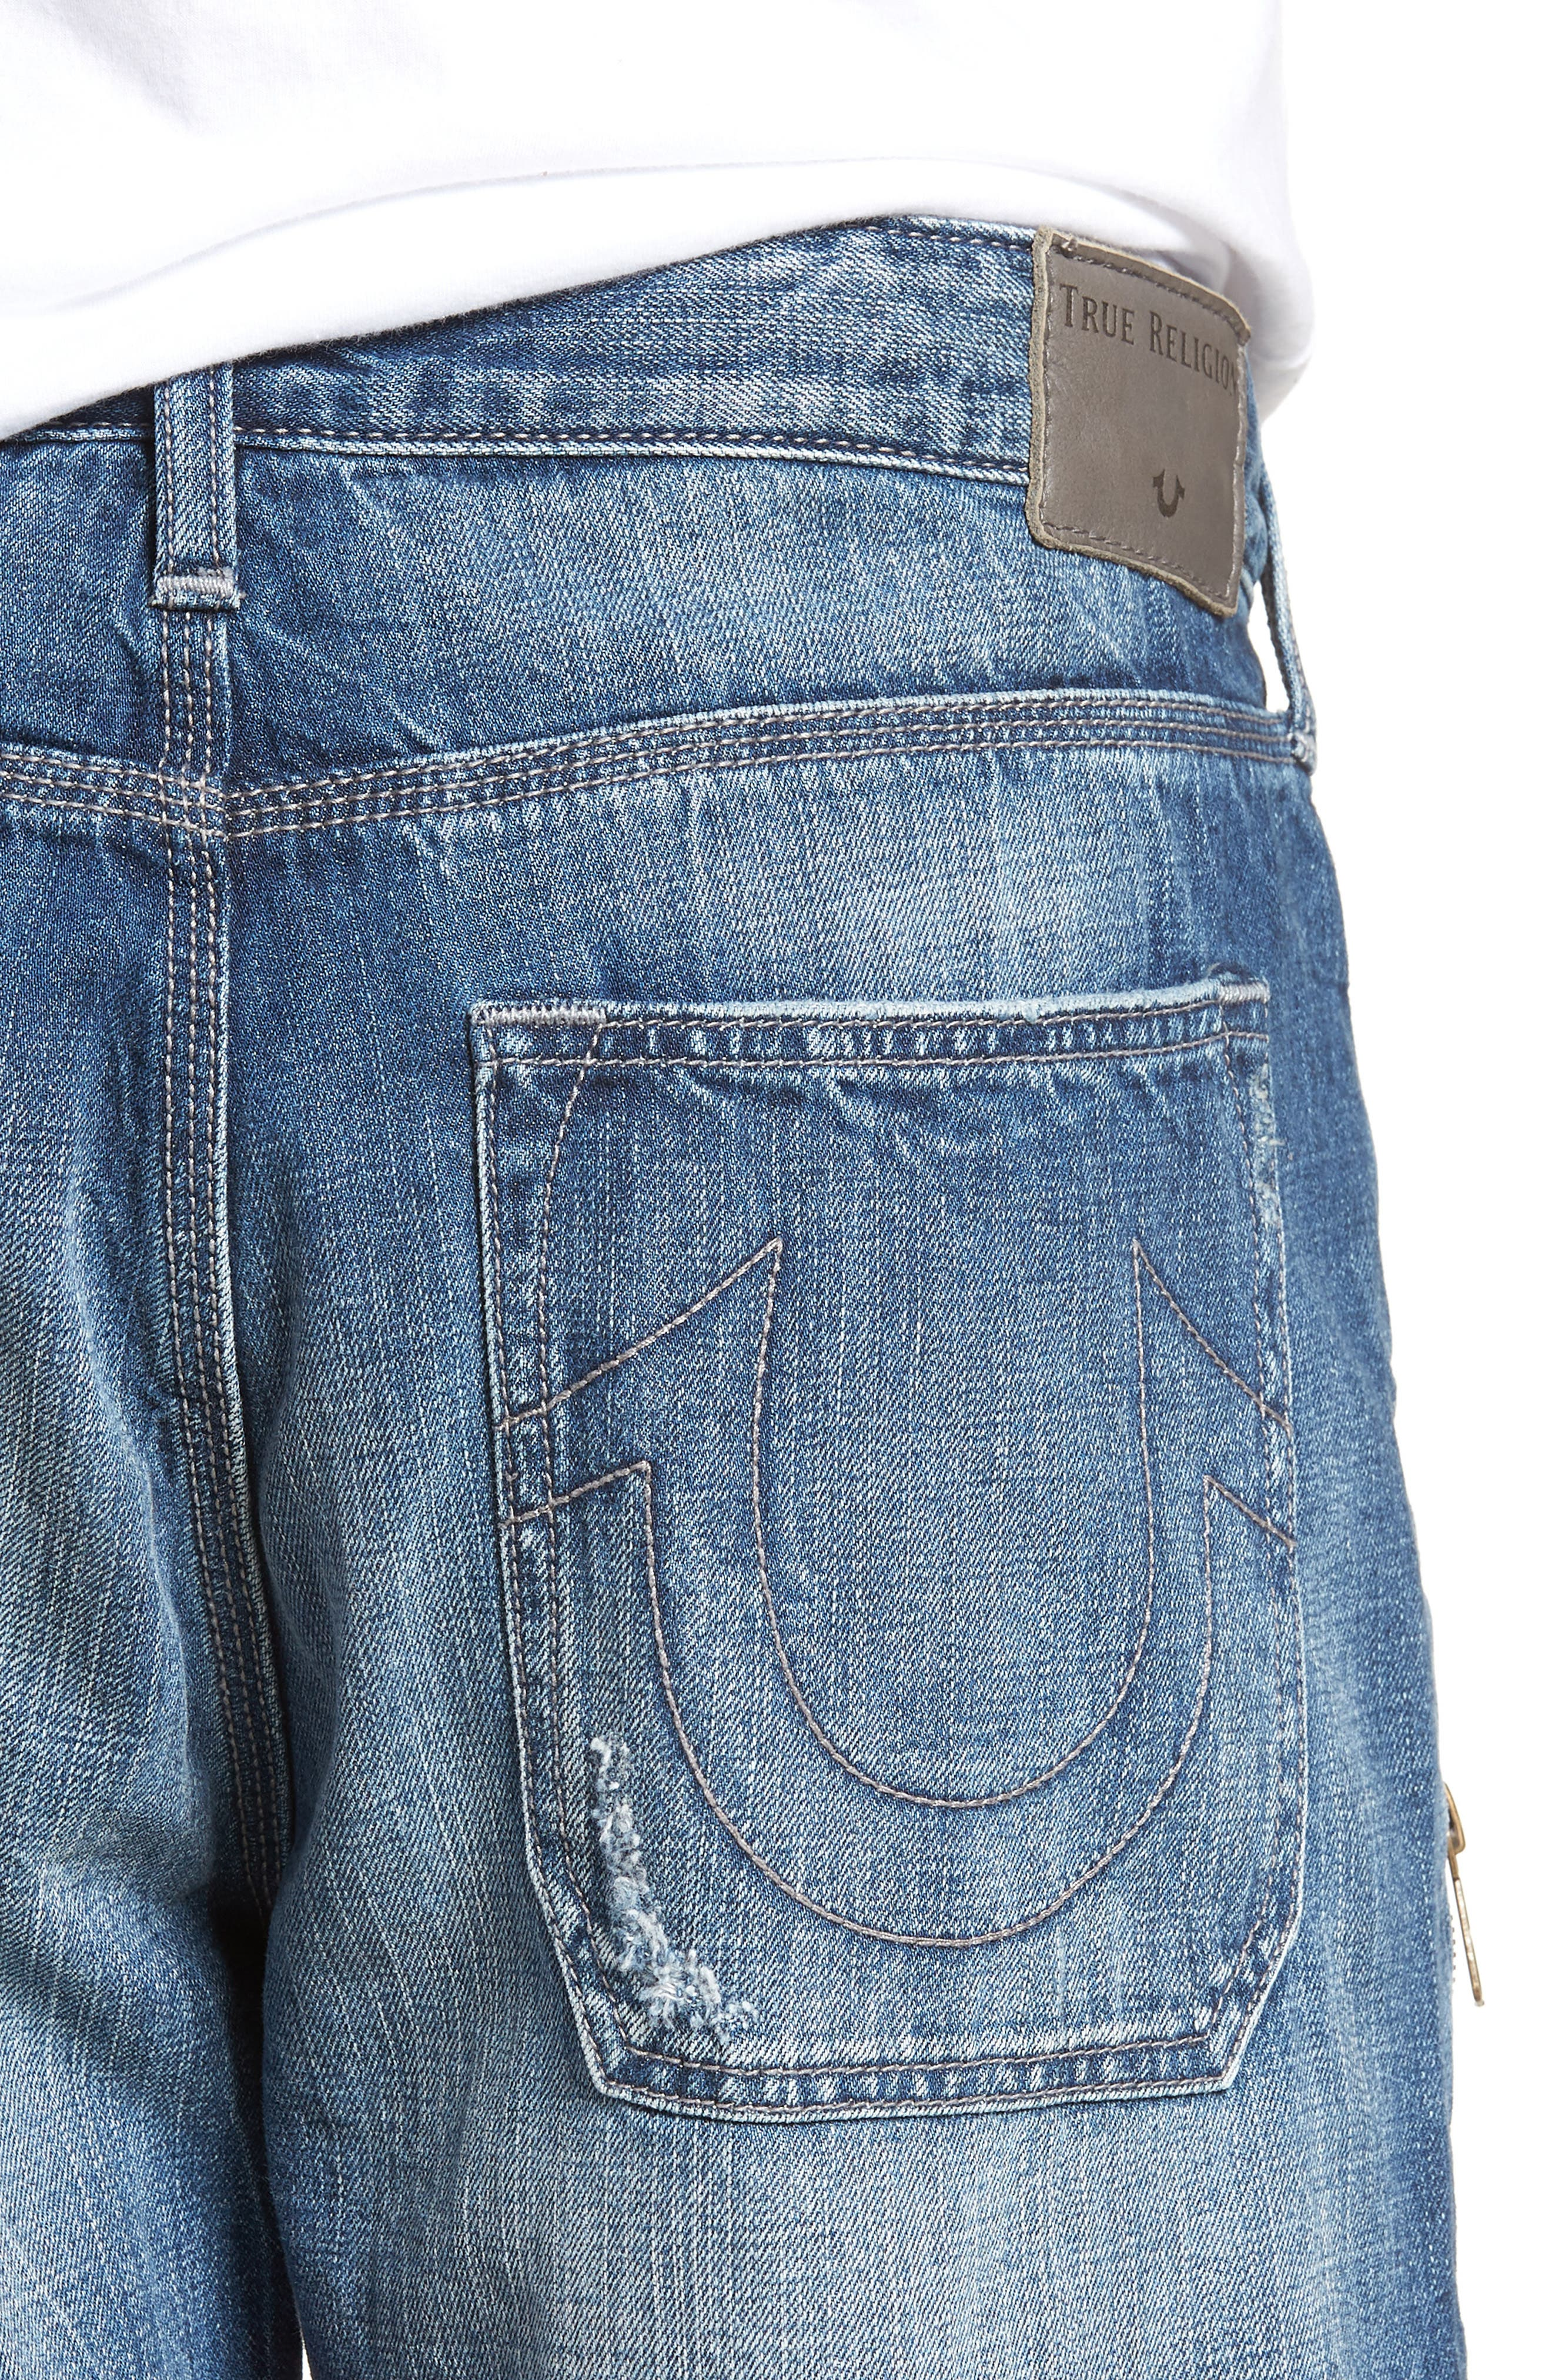 Field Shorts,                             Alternate thumbnail 4, color,                             Worn Glen